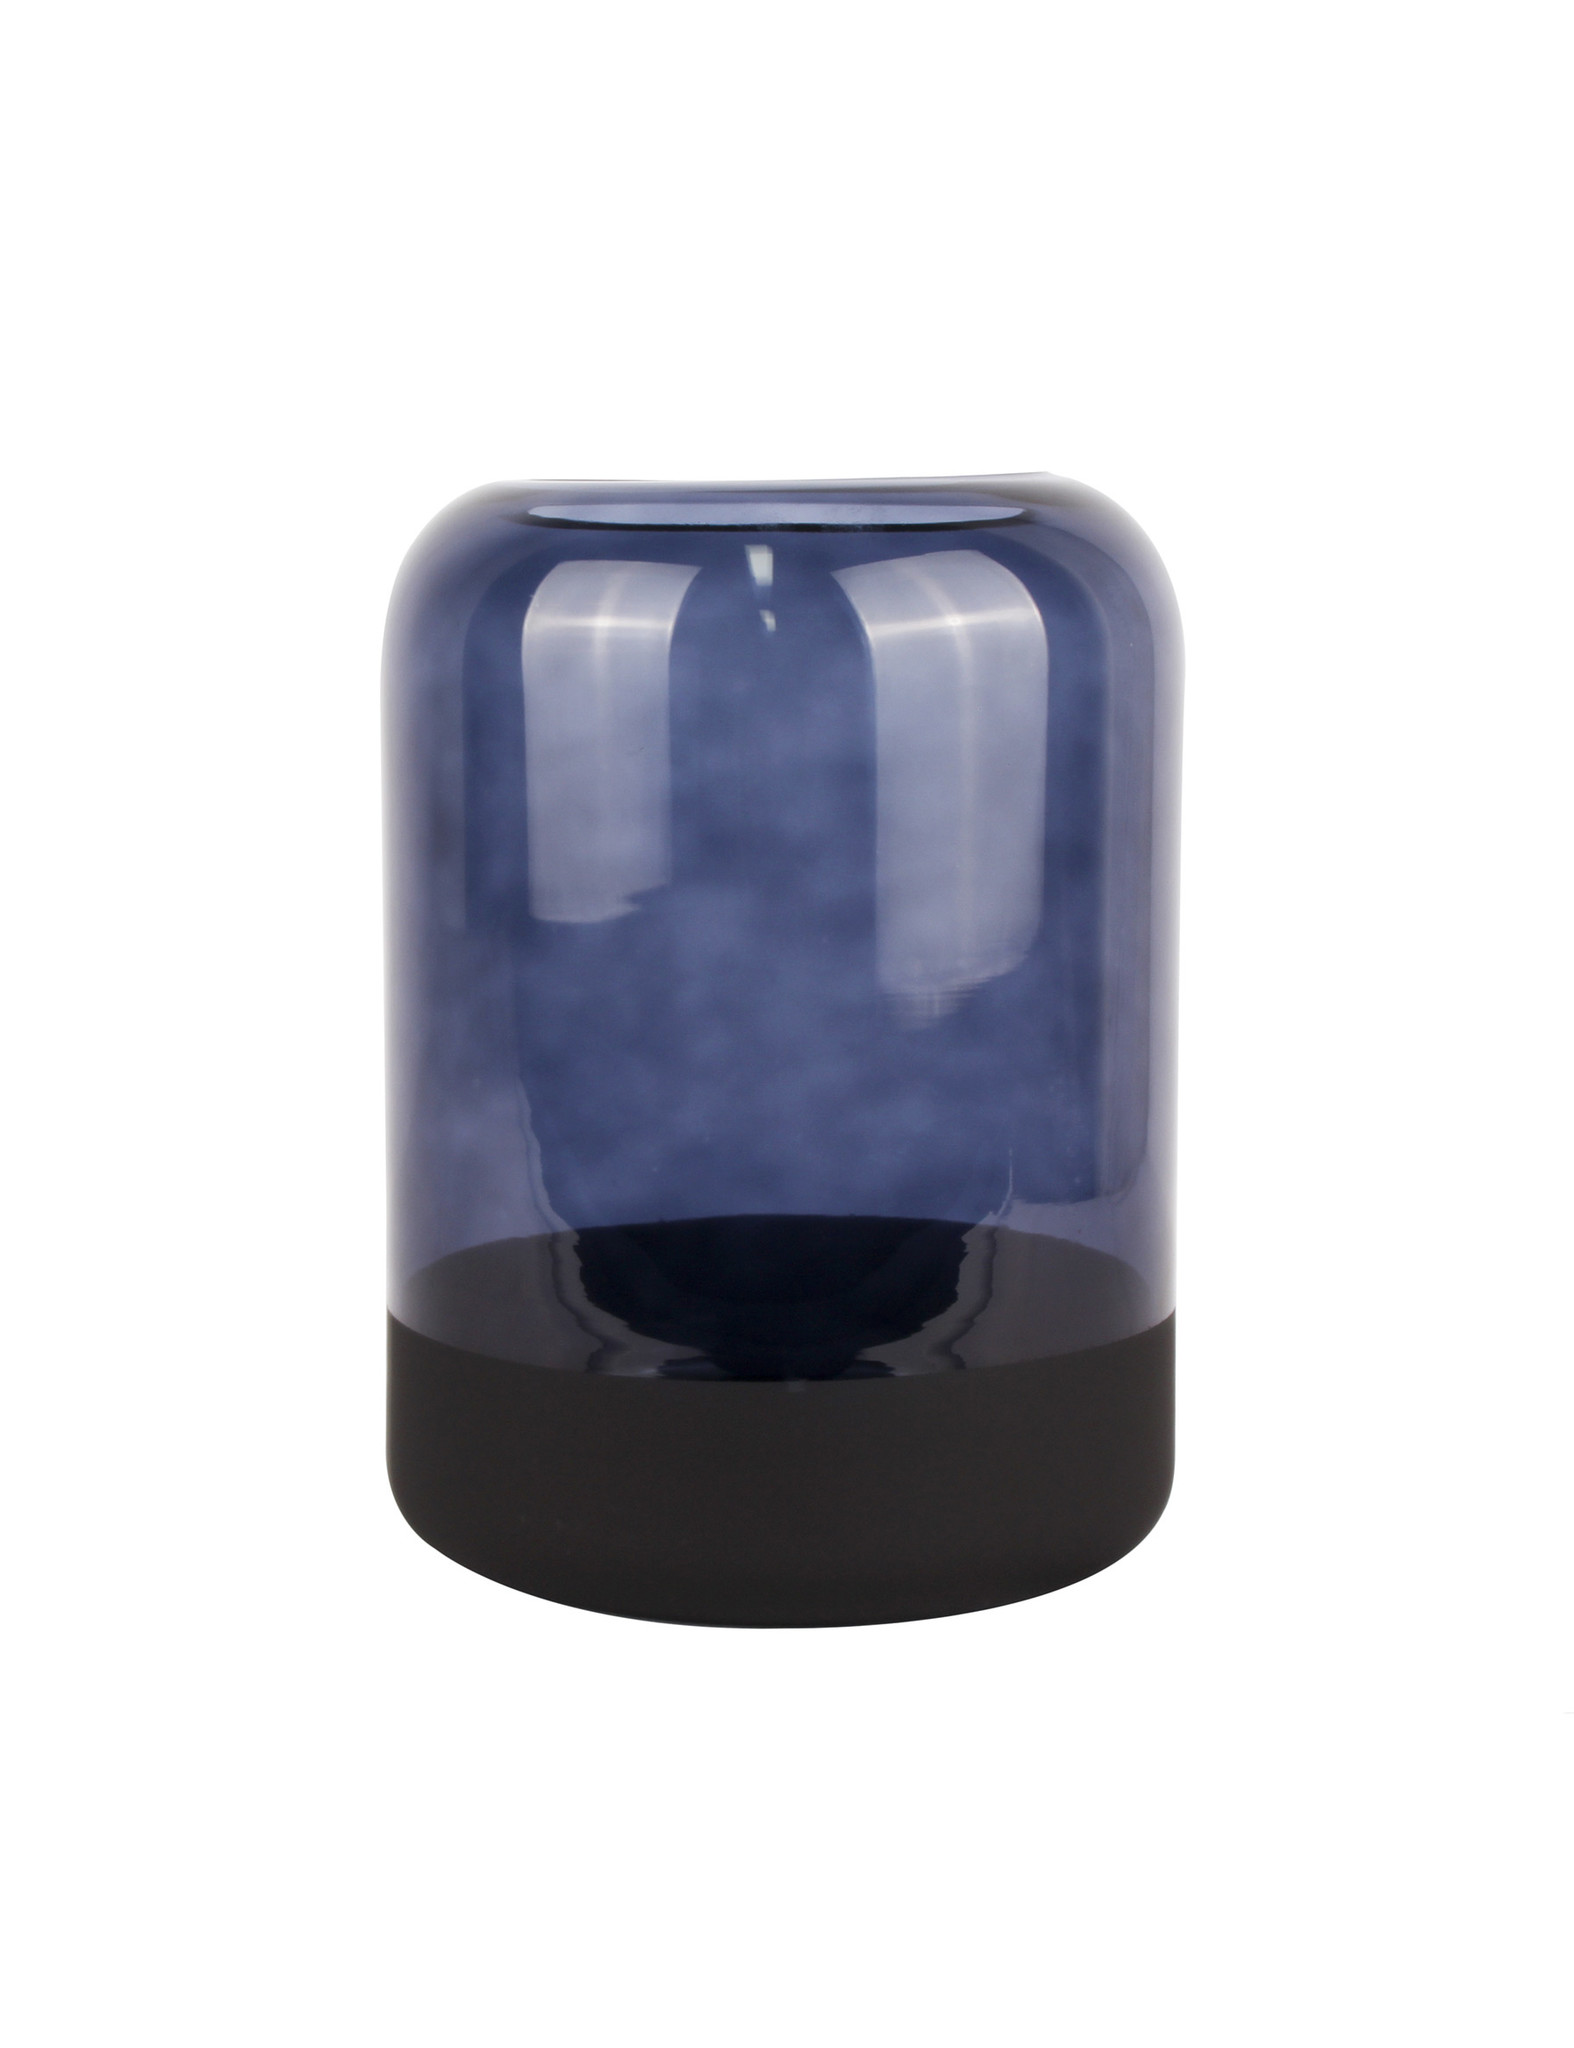 Blauwe glazen vaas - Present Time